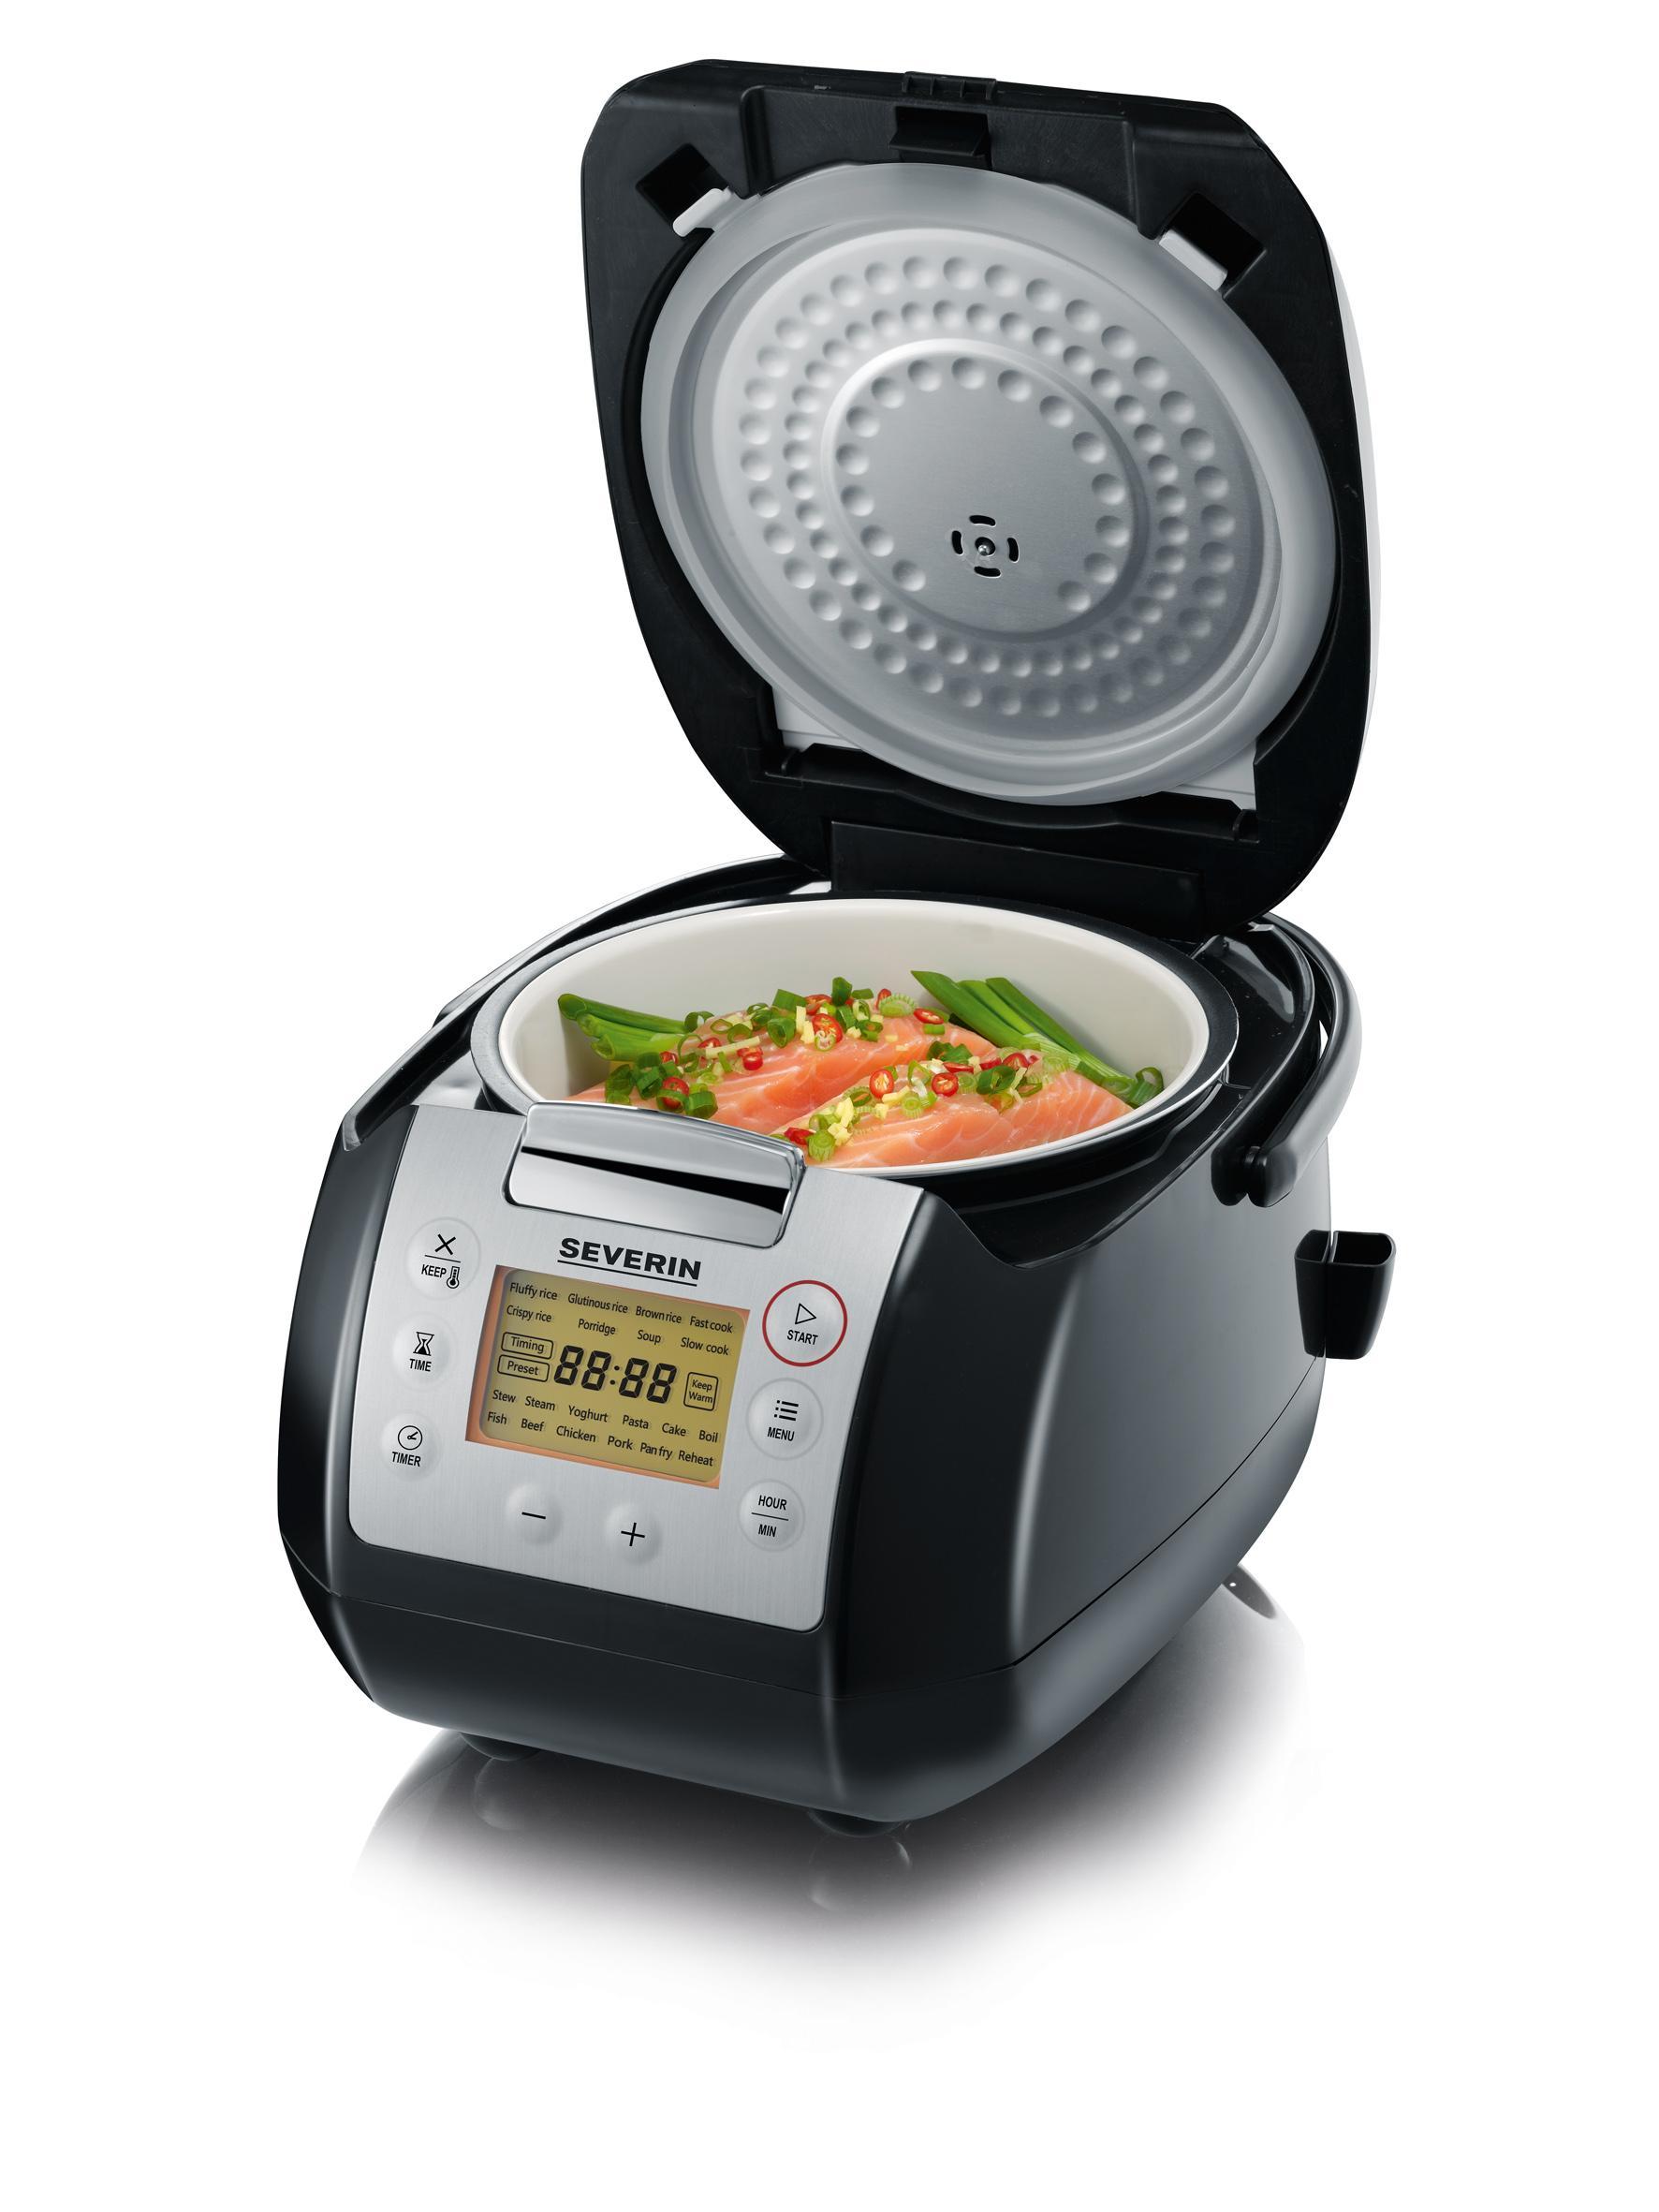 Amazon.de: Severin MC 2448 Multicooker (900 Watt, 5 L